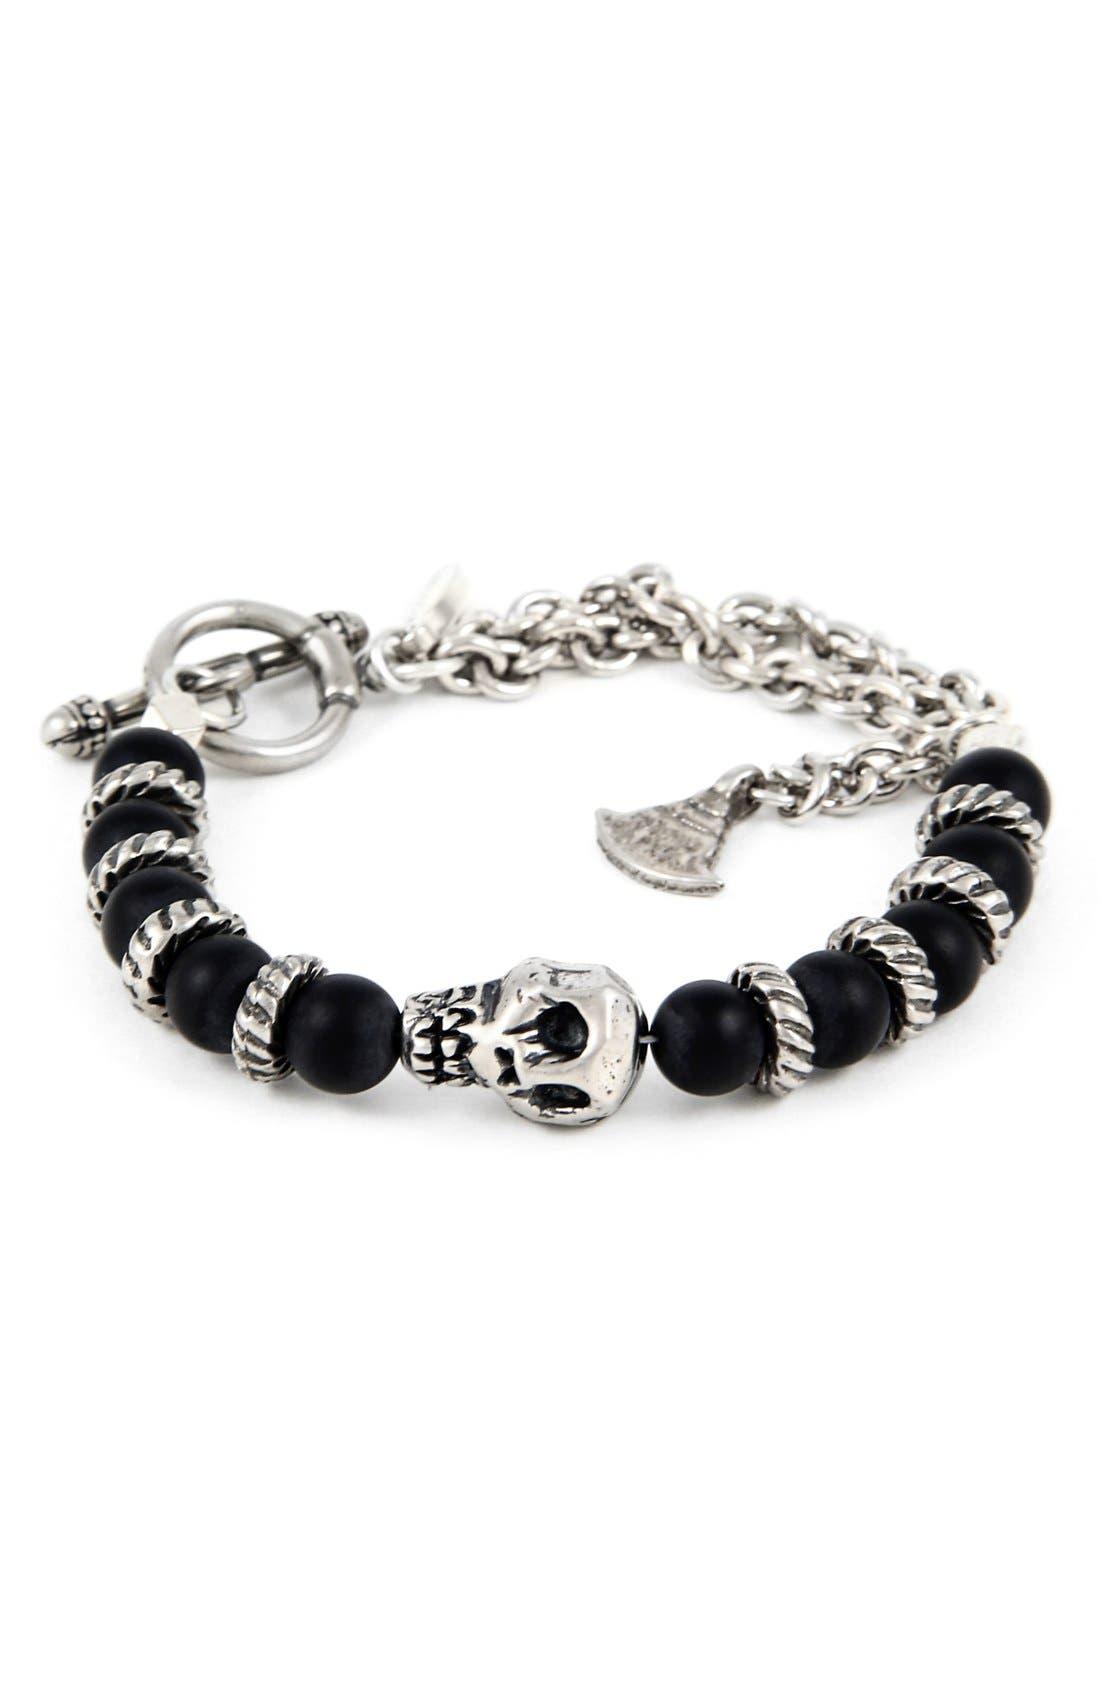 Silver Skull & Onyx Chain Bracelet,                             Main thumbnail 1, color,                             Black/ Silver